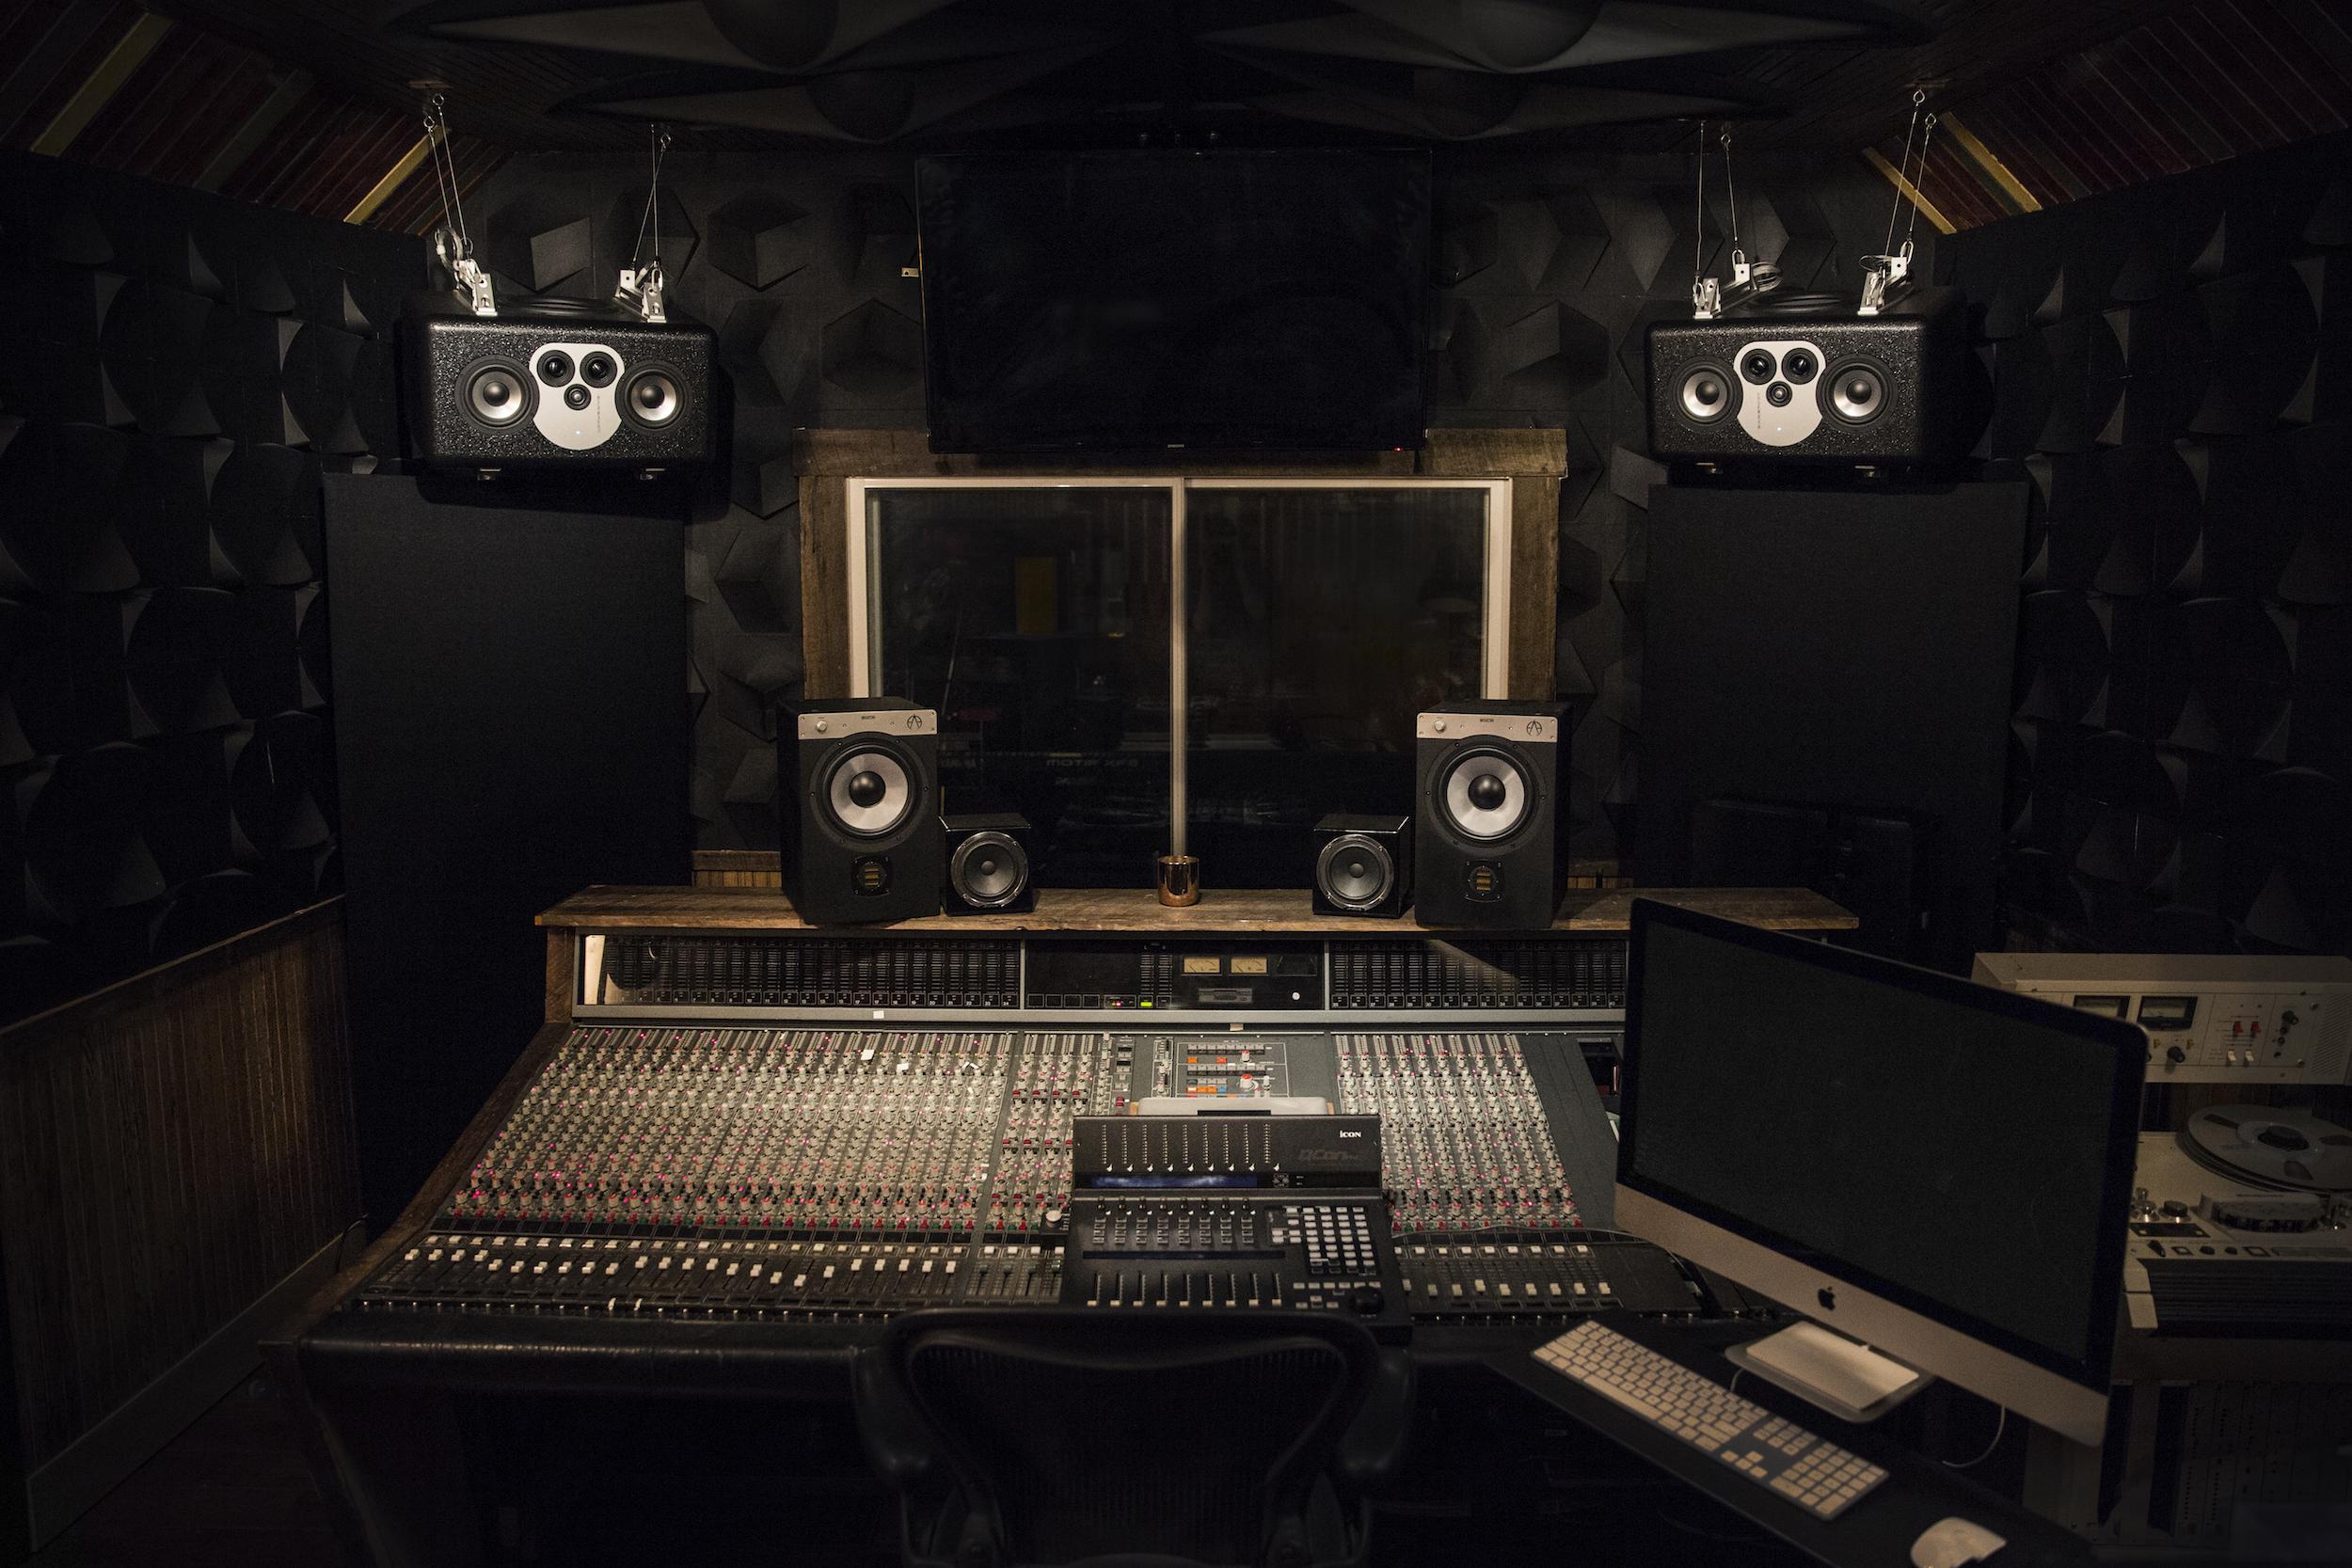 beyond studios dc recording studio. Black Bedroom Furniture Sets. Home Design Ideas